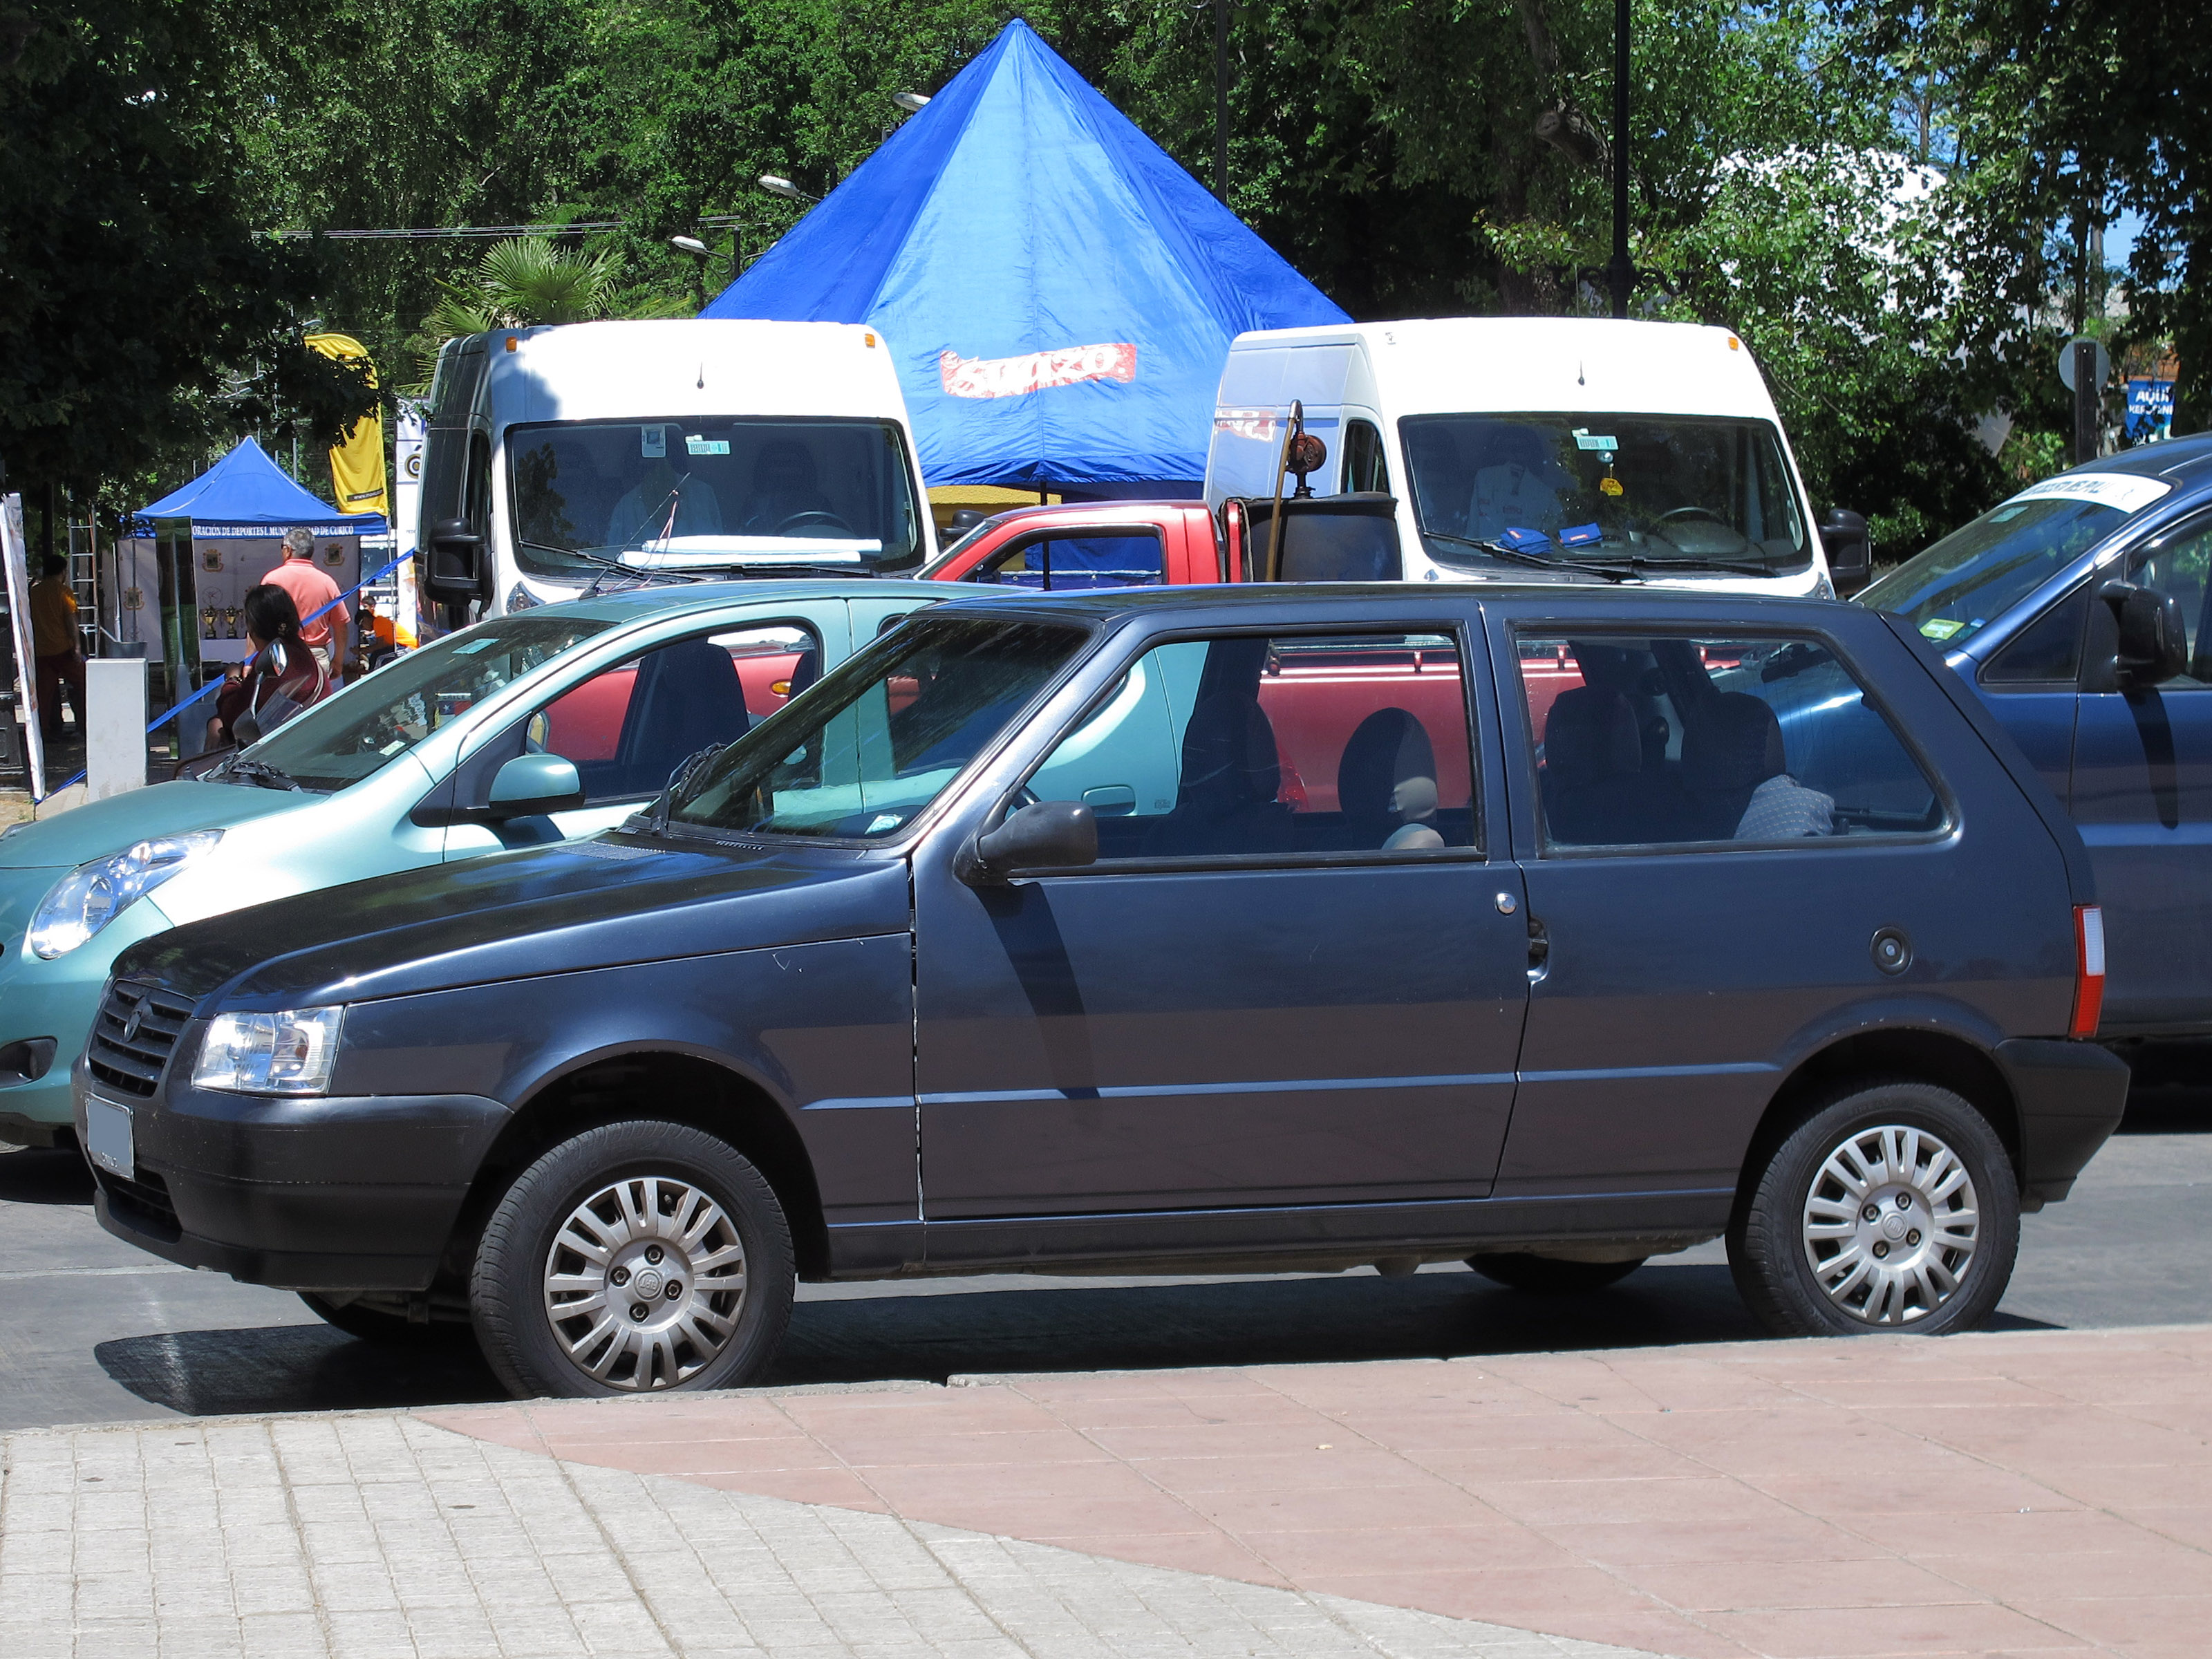 File:Fiat Uno 1.3 Fire 2006 (15146562113).jpg